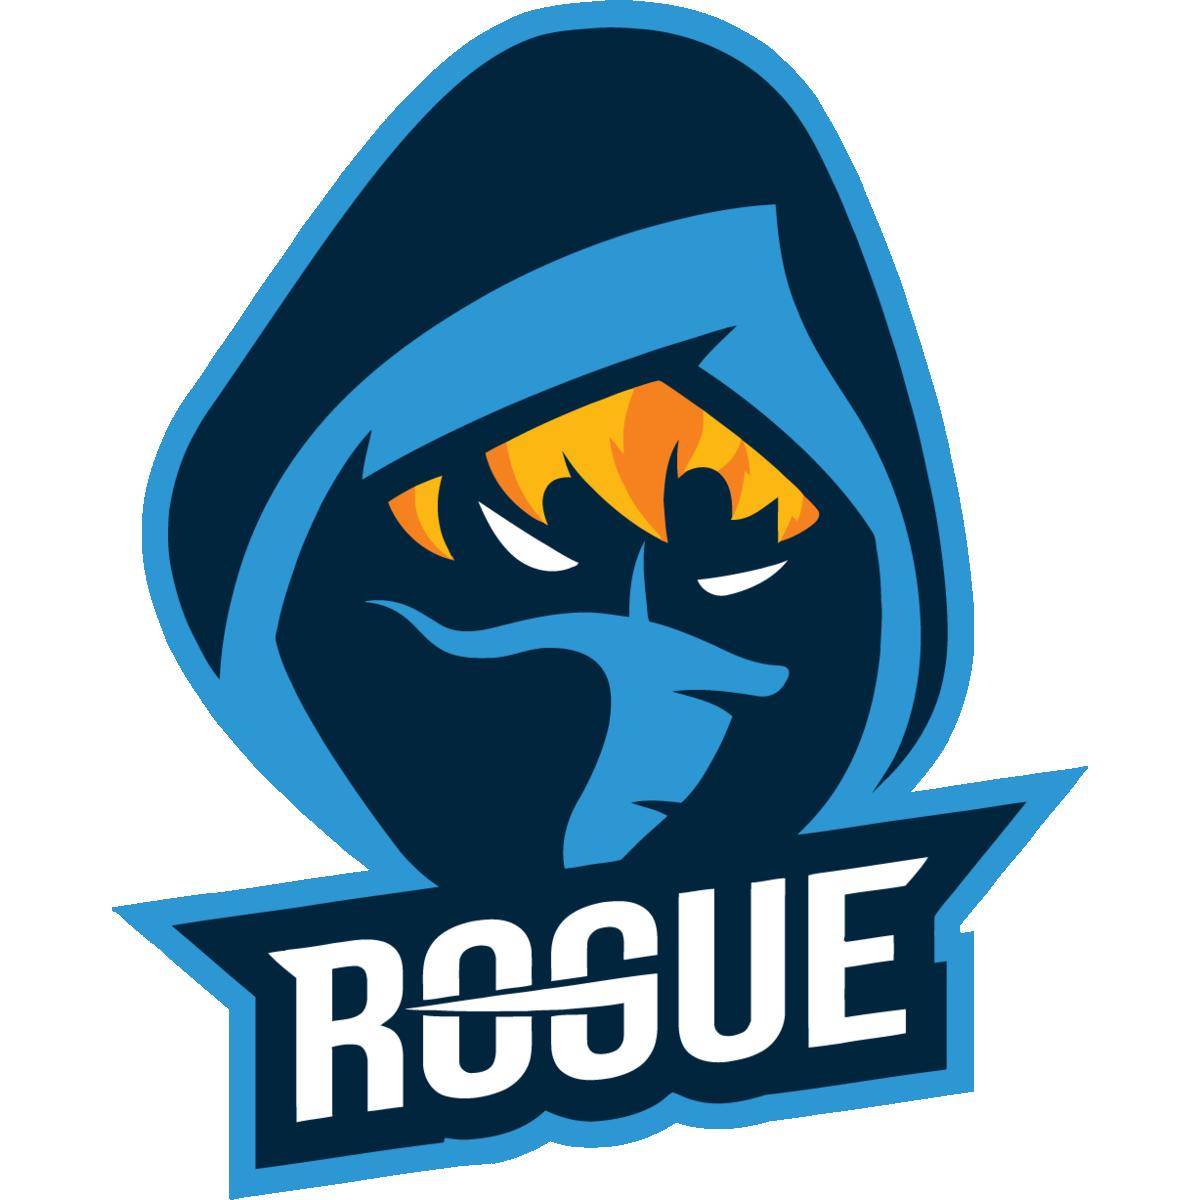 Rogue (lol)